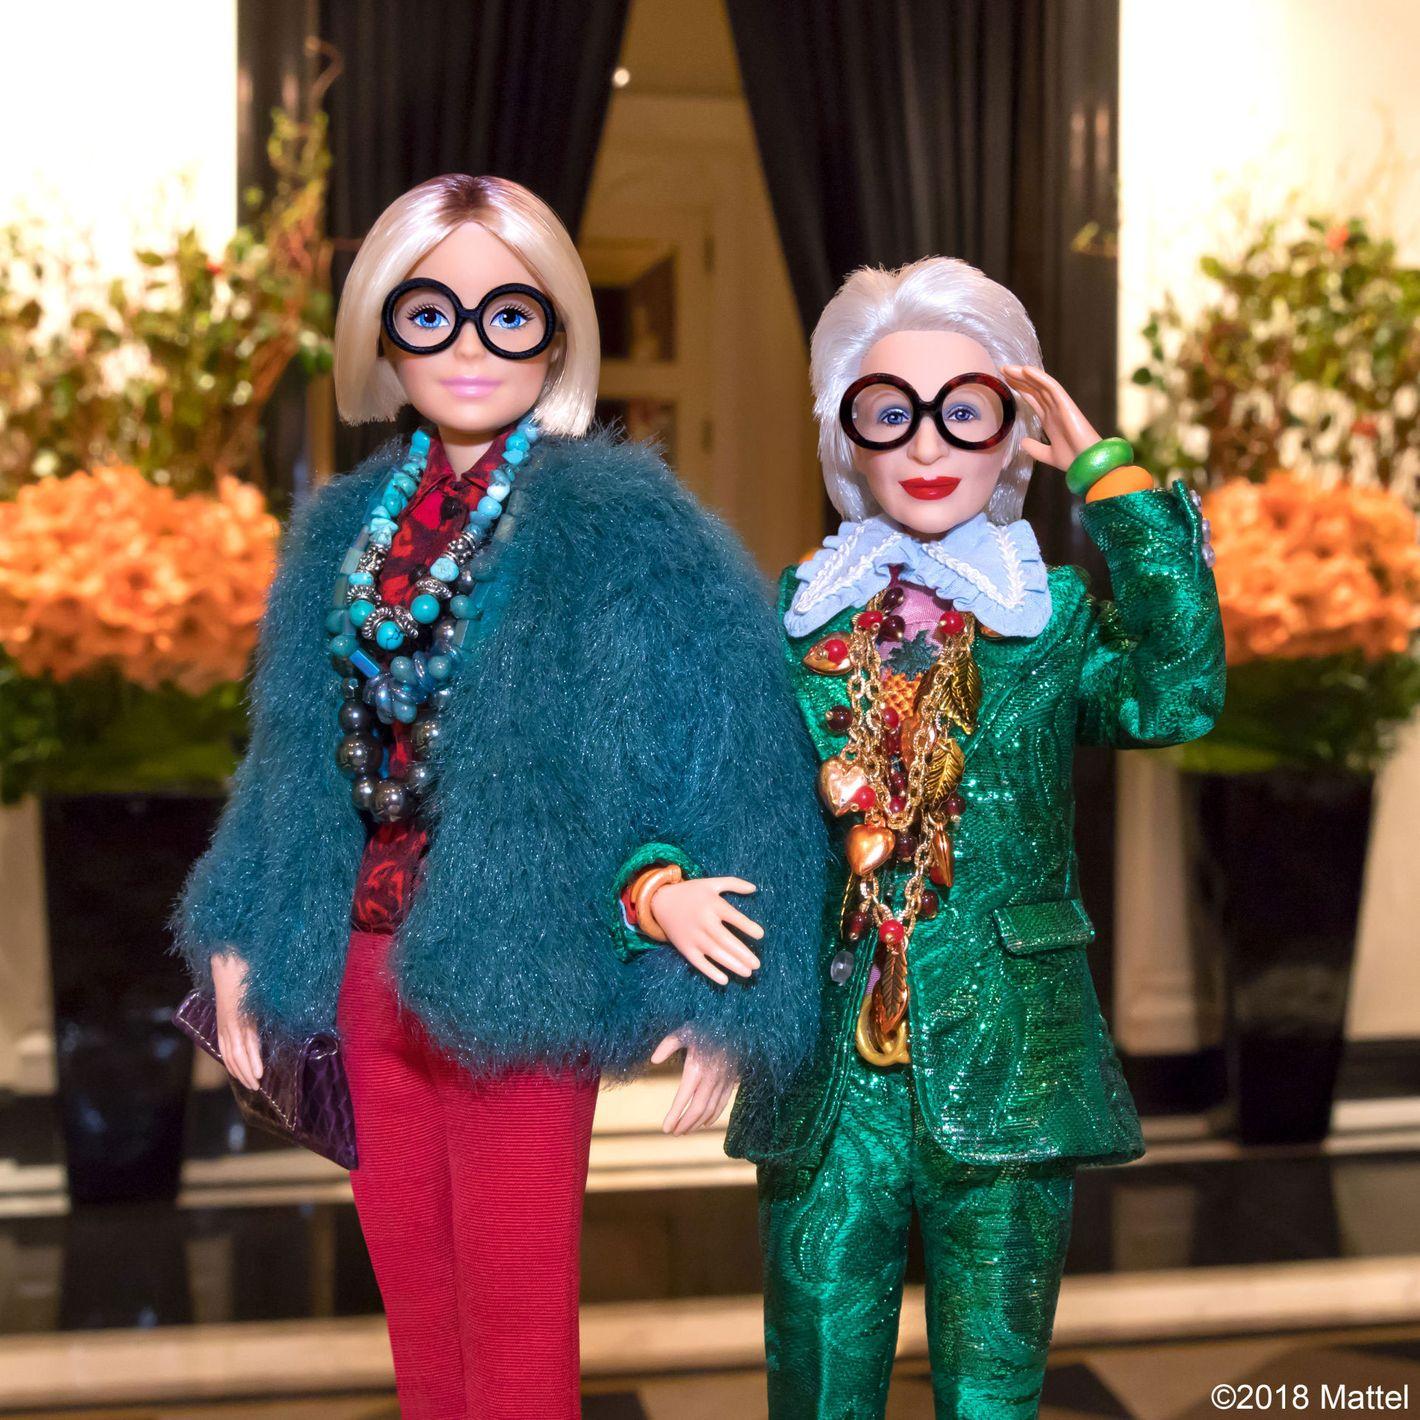 Style Icon Iris Apfel Gets the Barbie Treatment